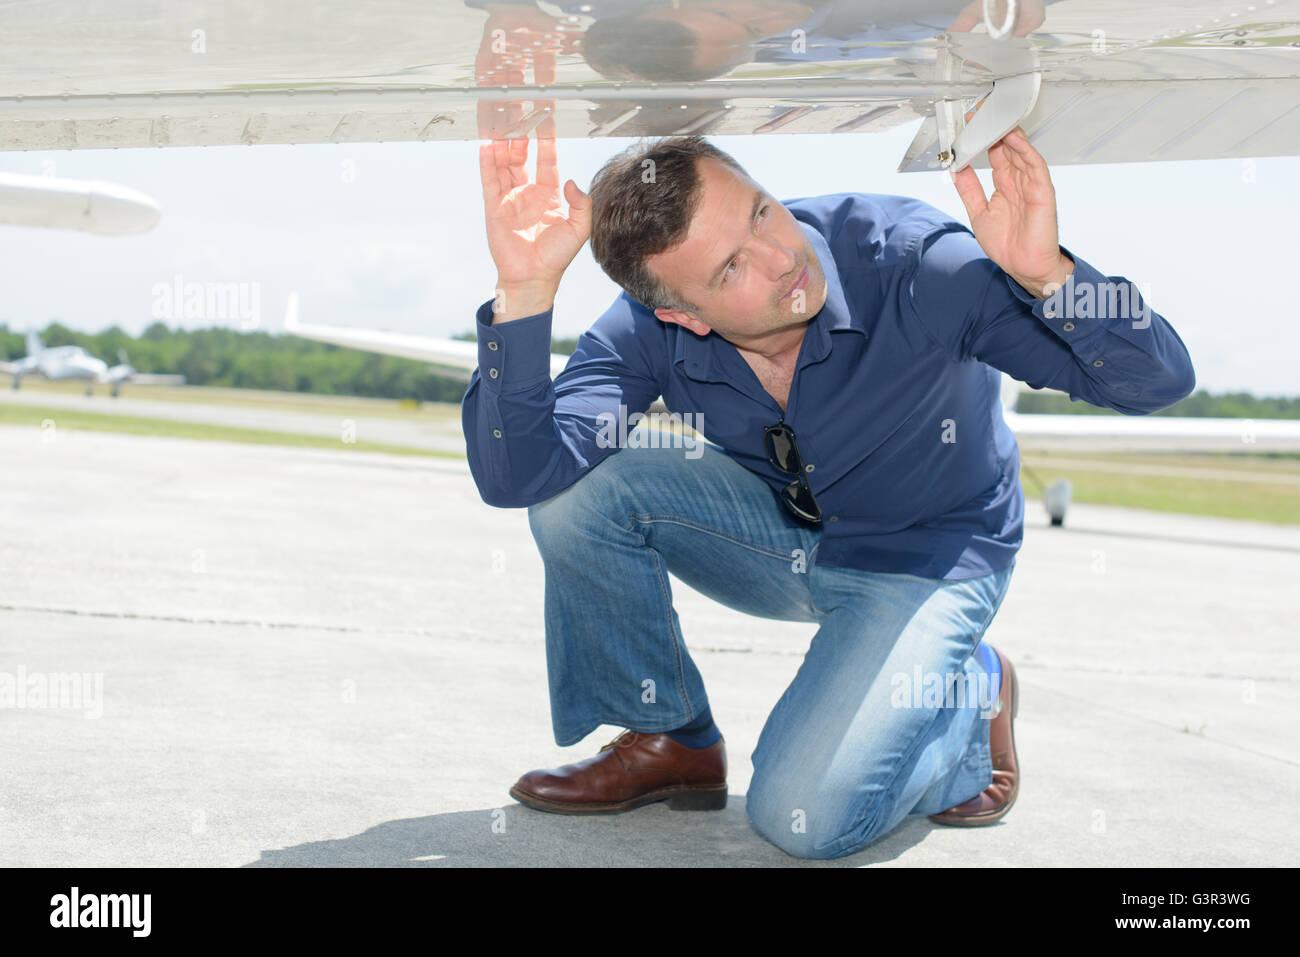 Man looking at underside of aircraft - Stock Image